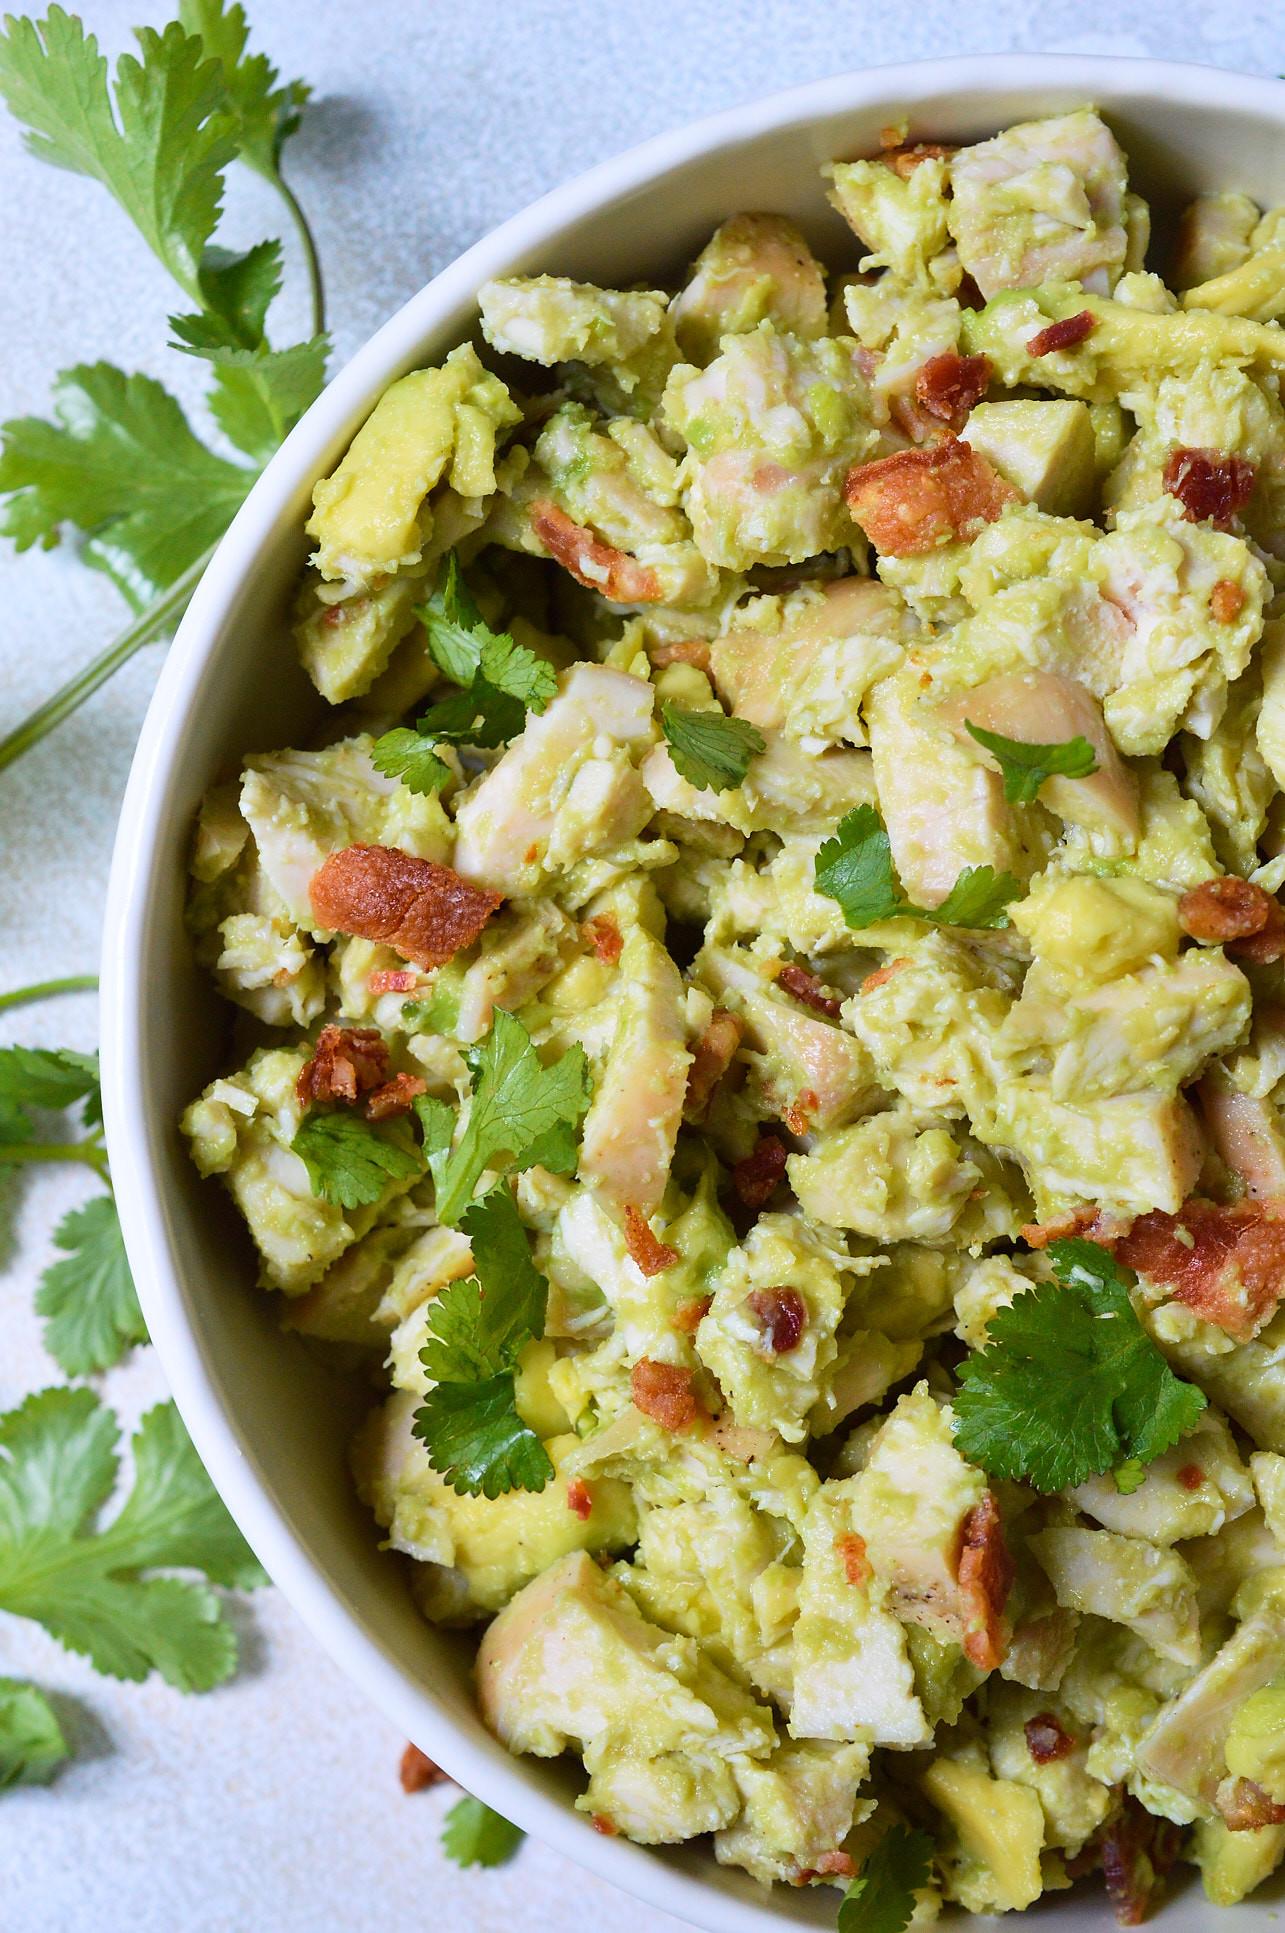 Is Chicken Salad Healthy  Bacon Avocado Chicken Salad Whole30 Recipe WonkyWonderful